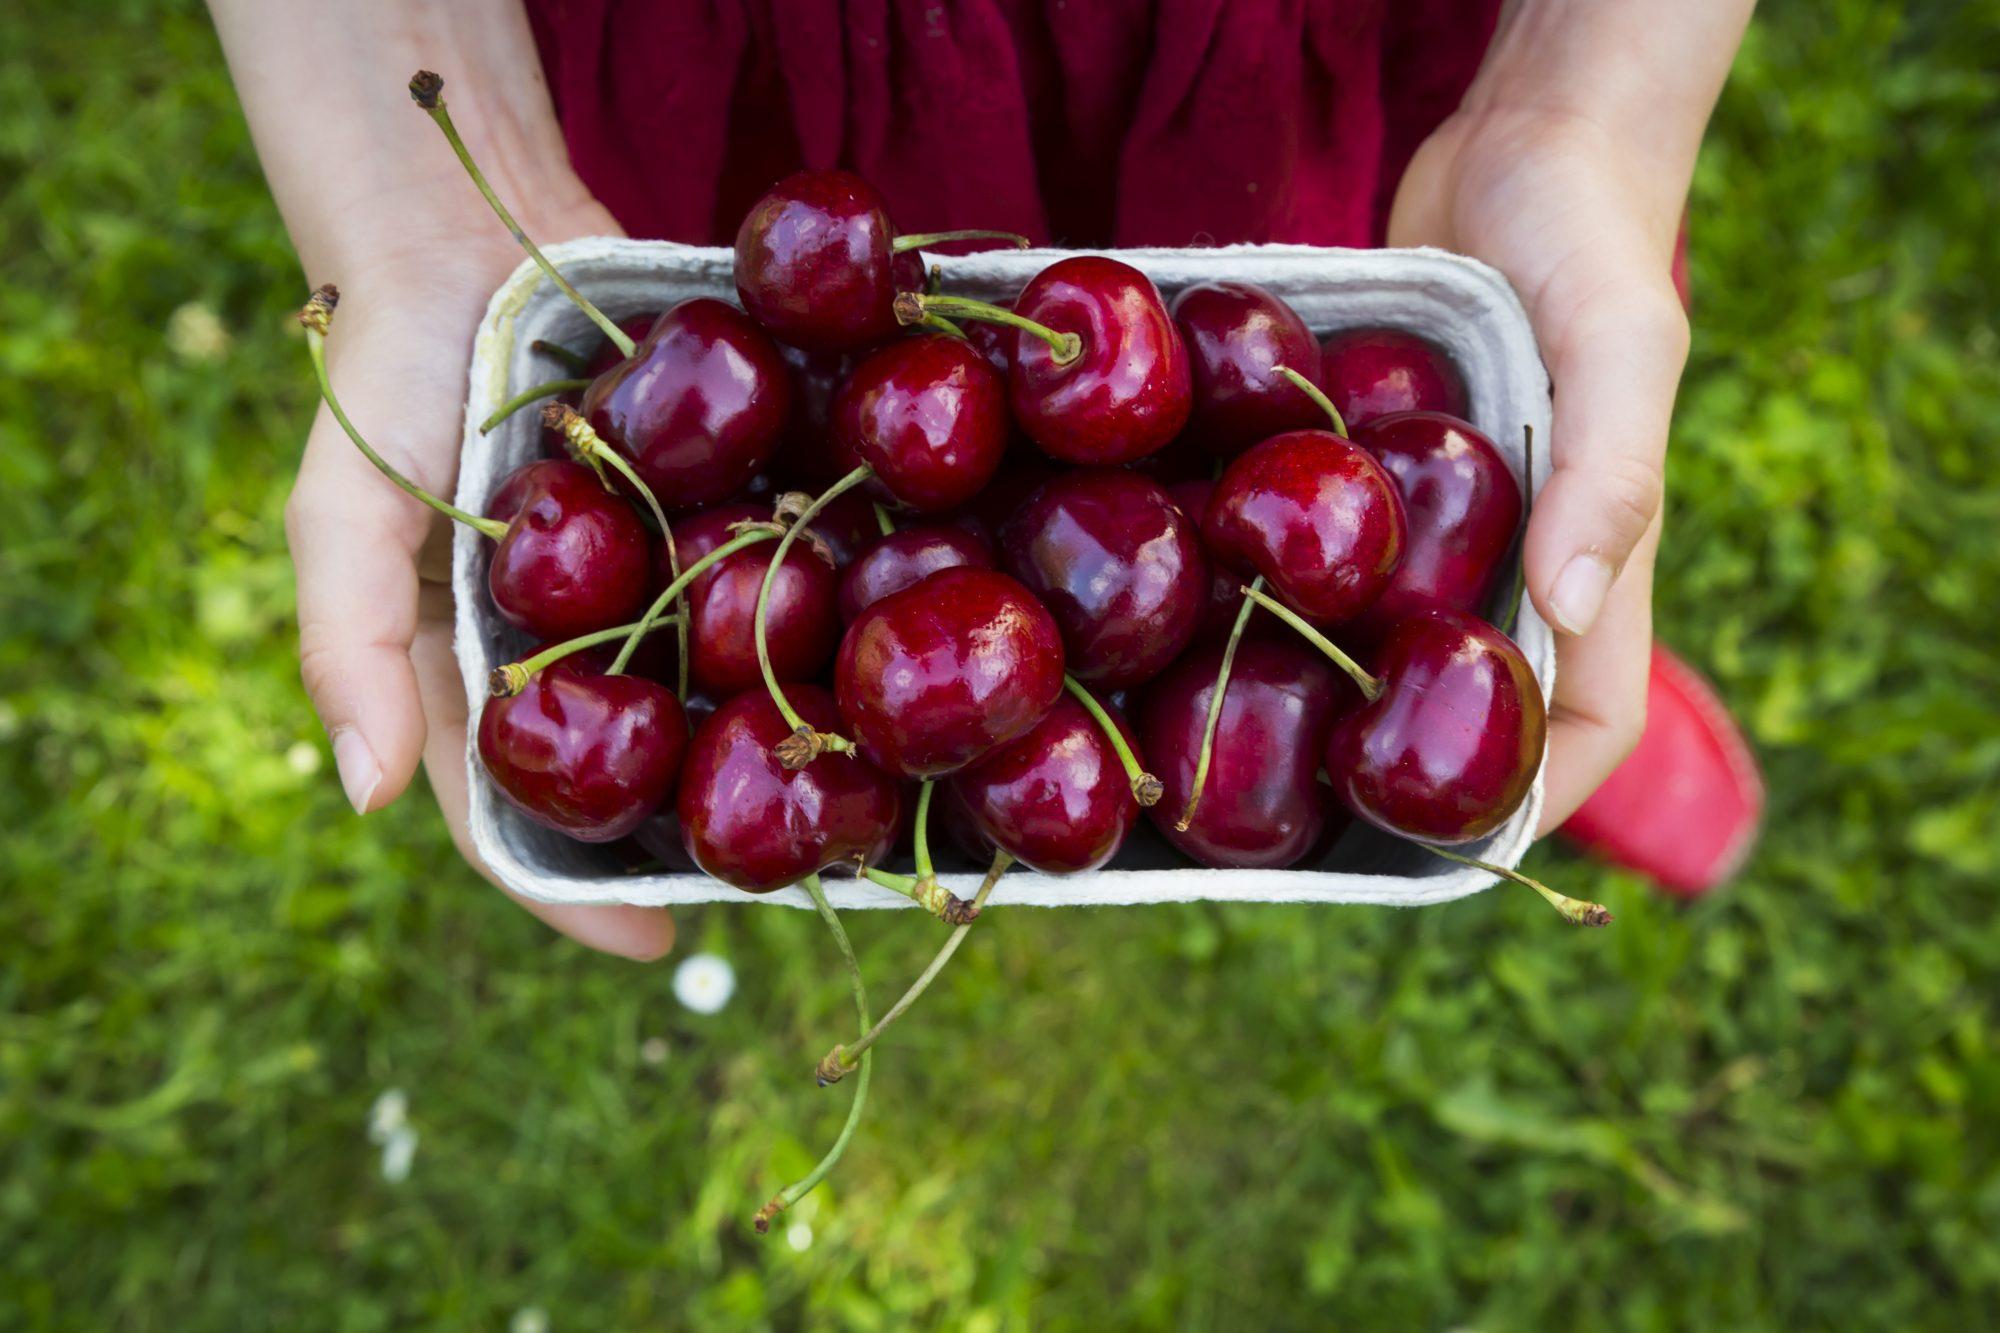 Some Health Benefits of Fruit Cherries